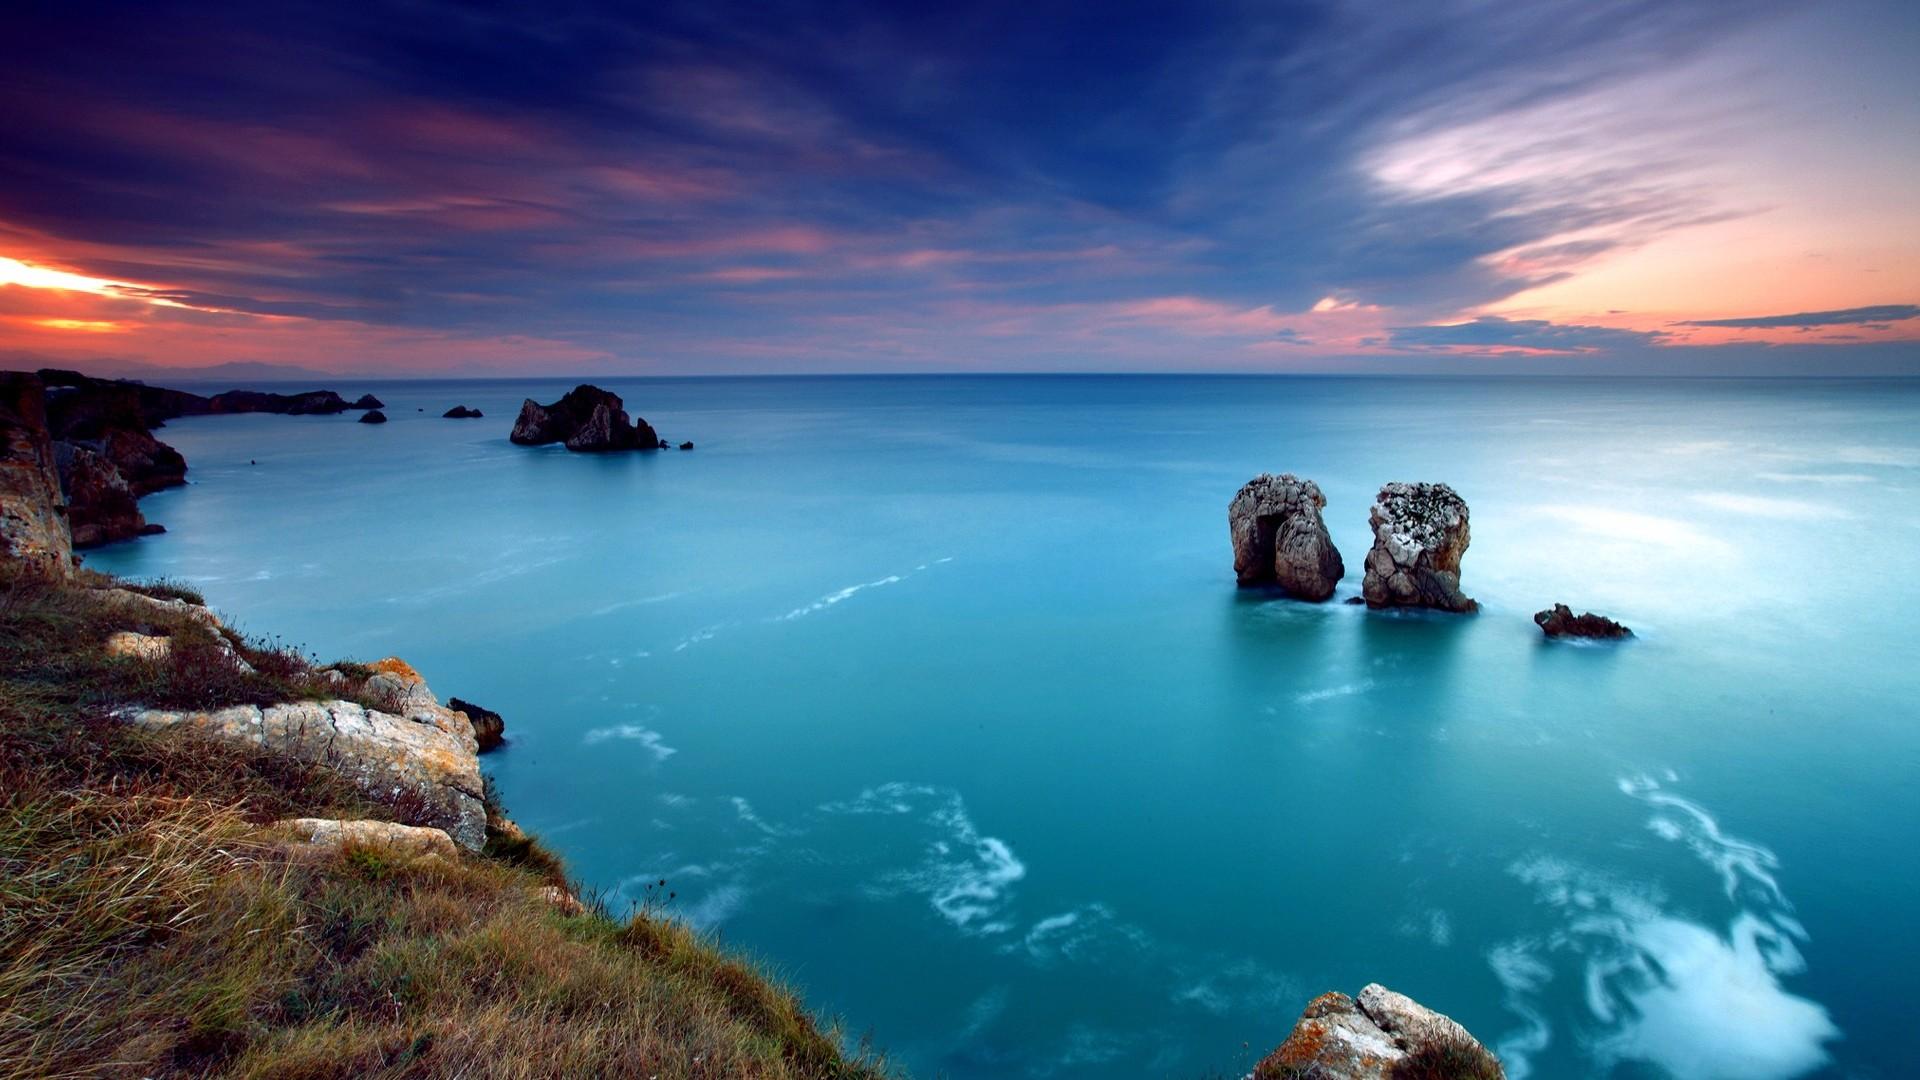 the ocean wallpapers category of free hd wallpapers beautiful ocean .